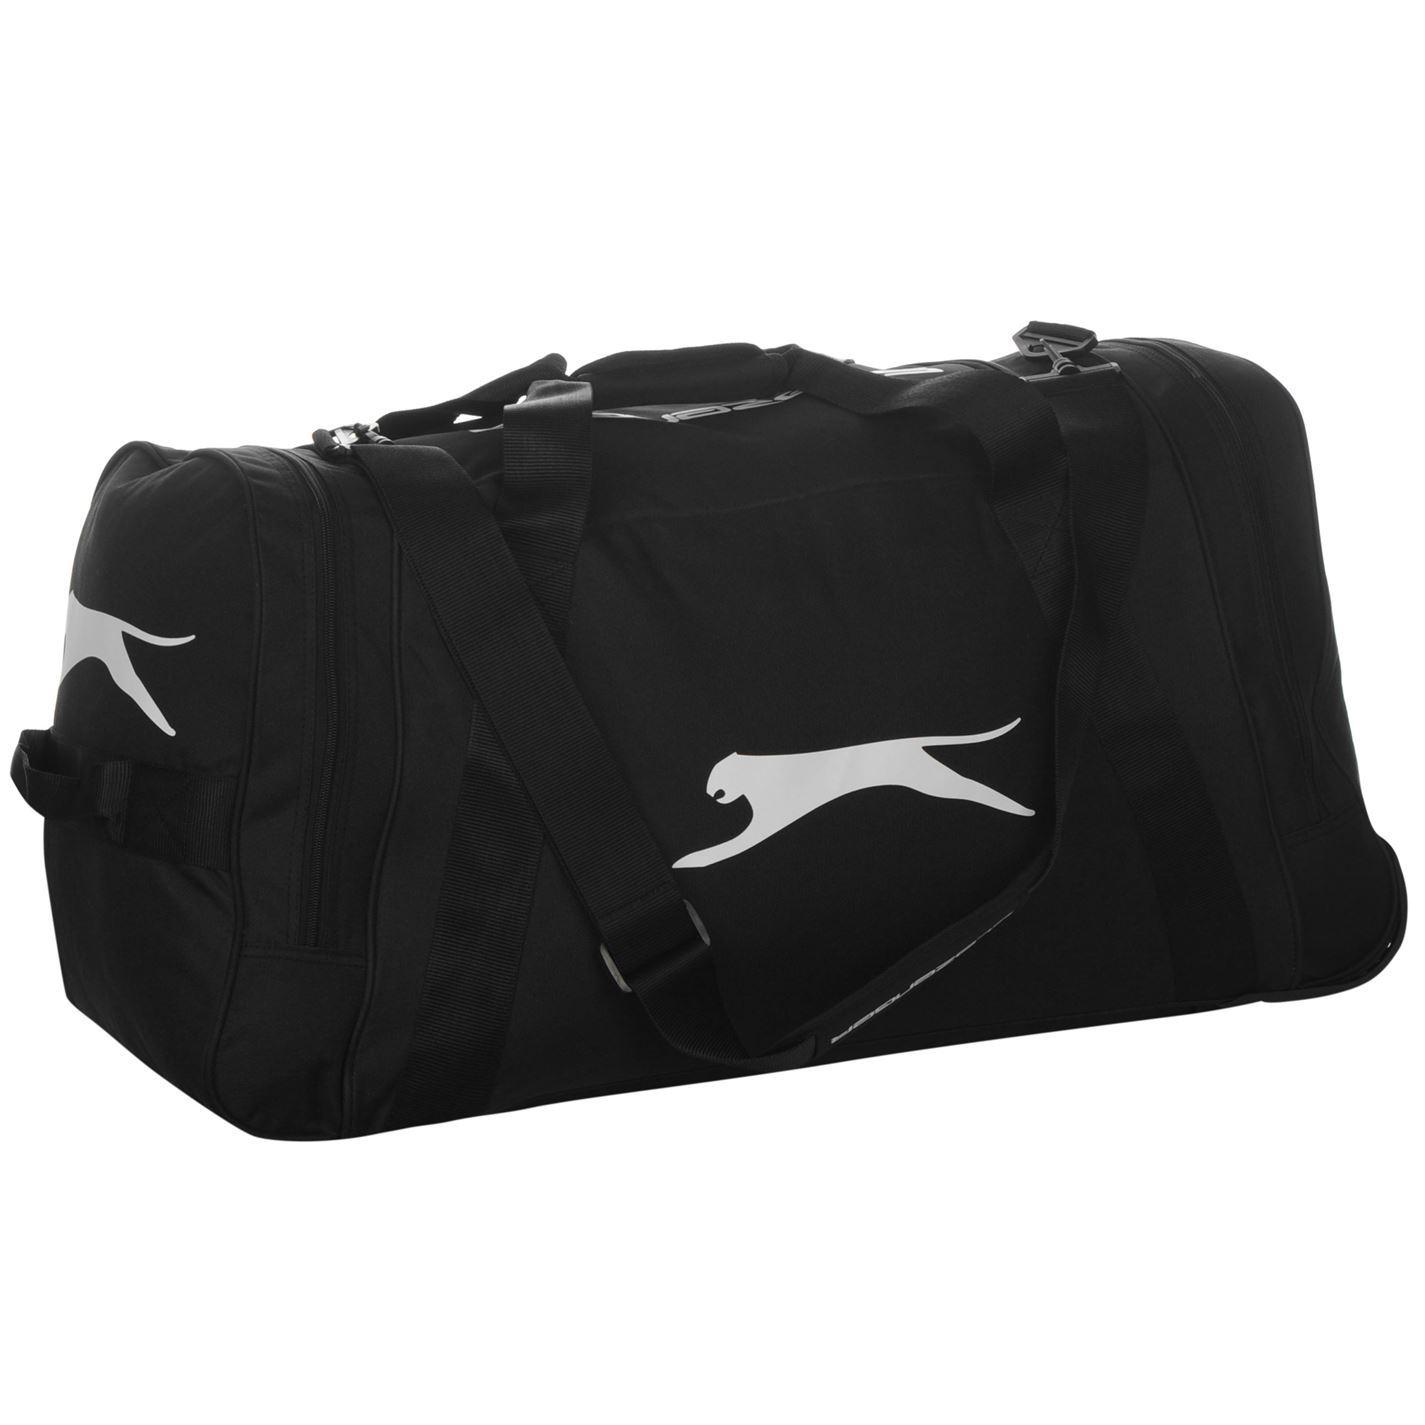 Slazenger Holdalls Sports Sports Holdalls Bag Kitbag Carryall Duffle Bag b88586